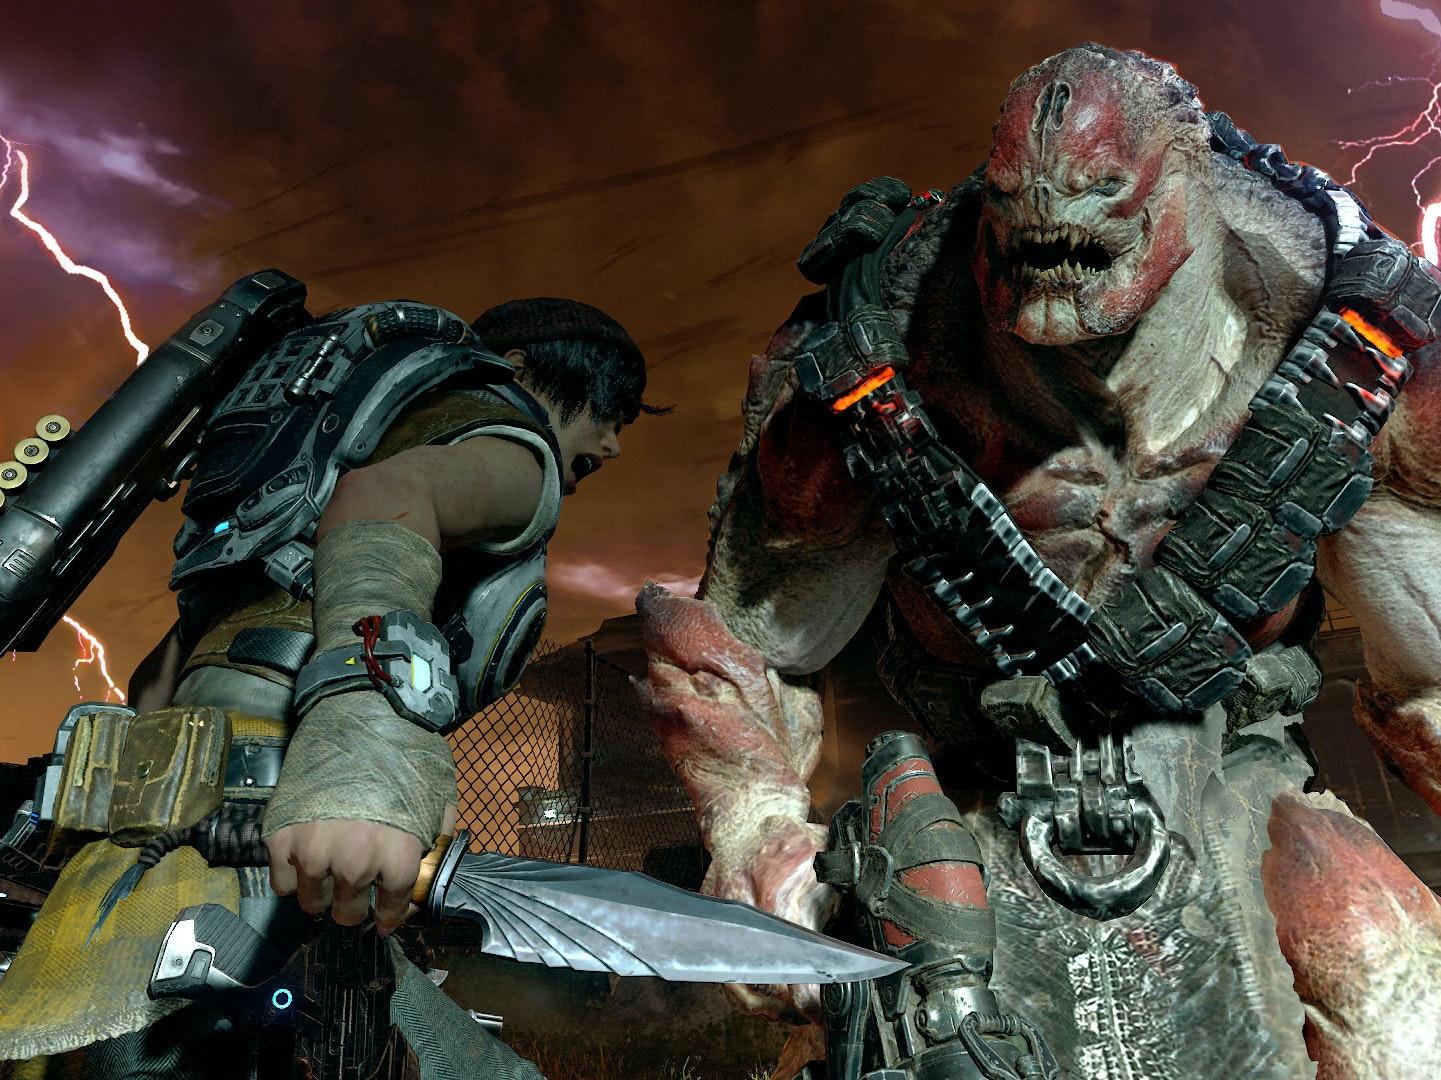 How to Survive in 'Gears of War 4' Horde Mode